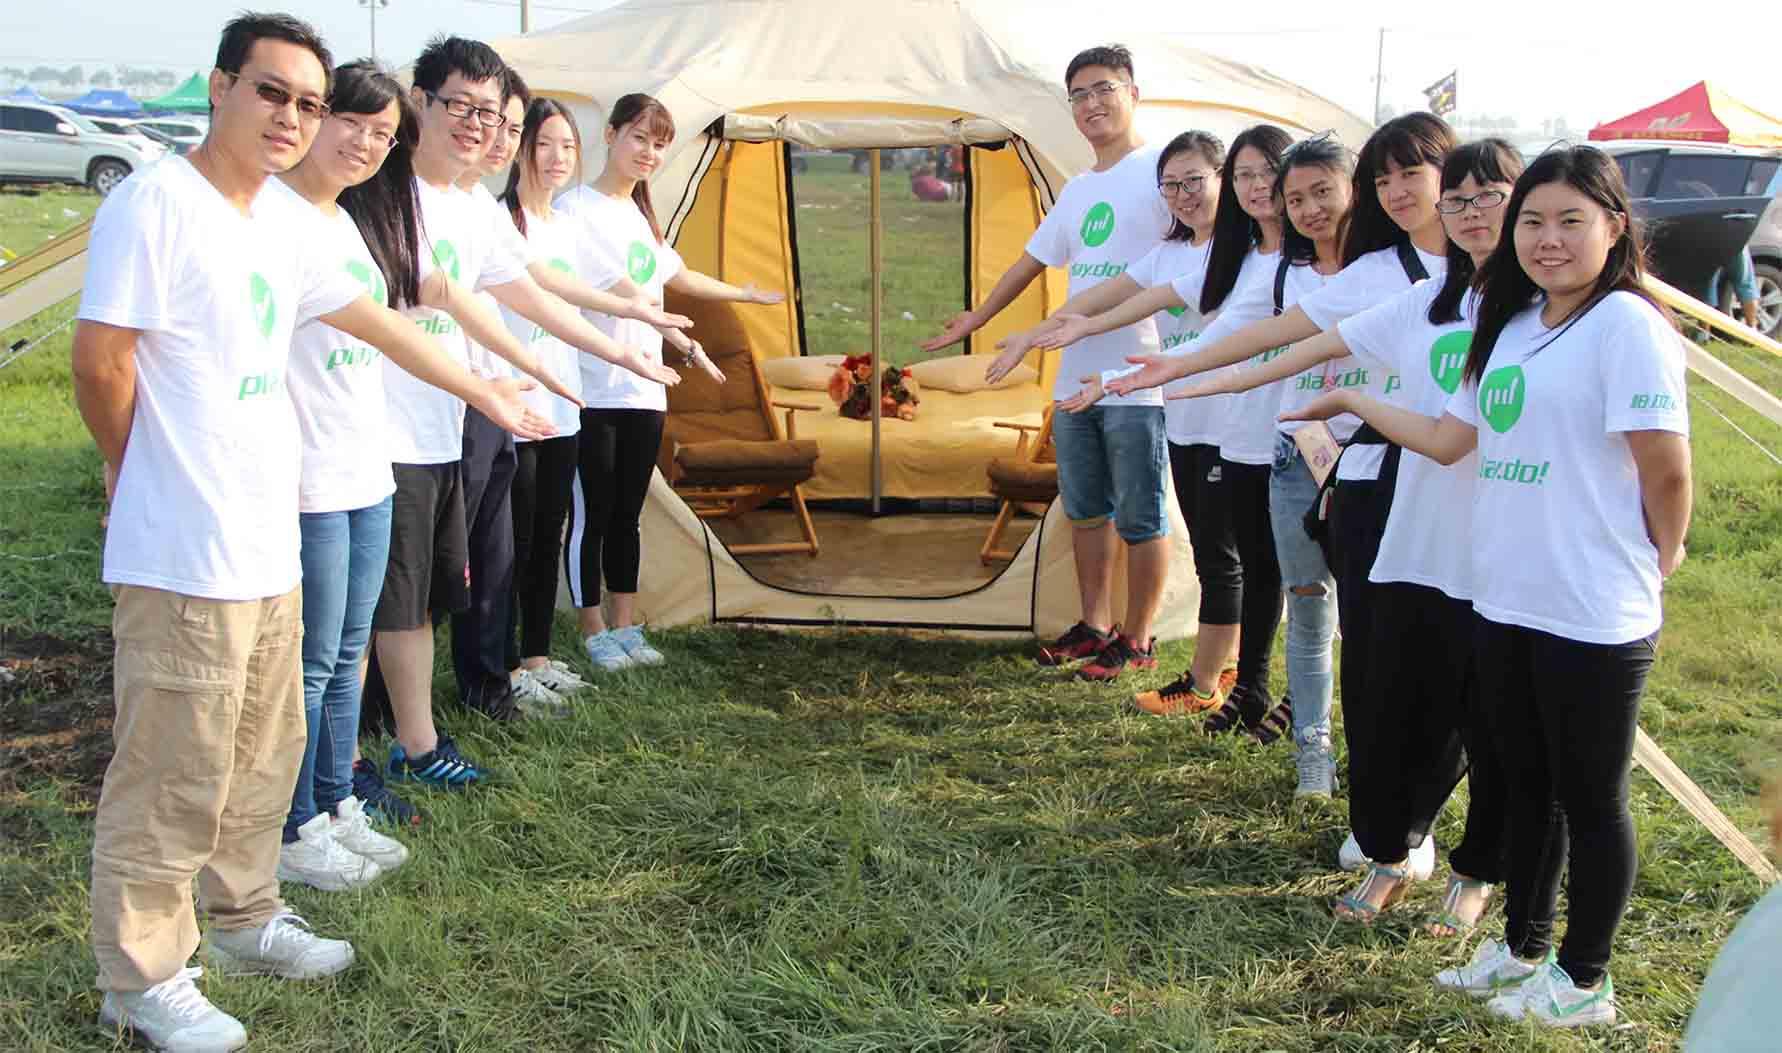 2016.07.29~31 PLAYDO Camping at Zhangbei Grassland Music Festival